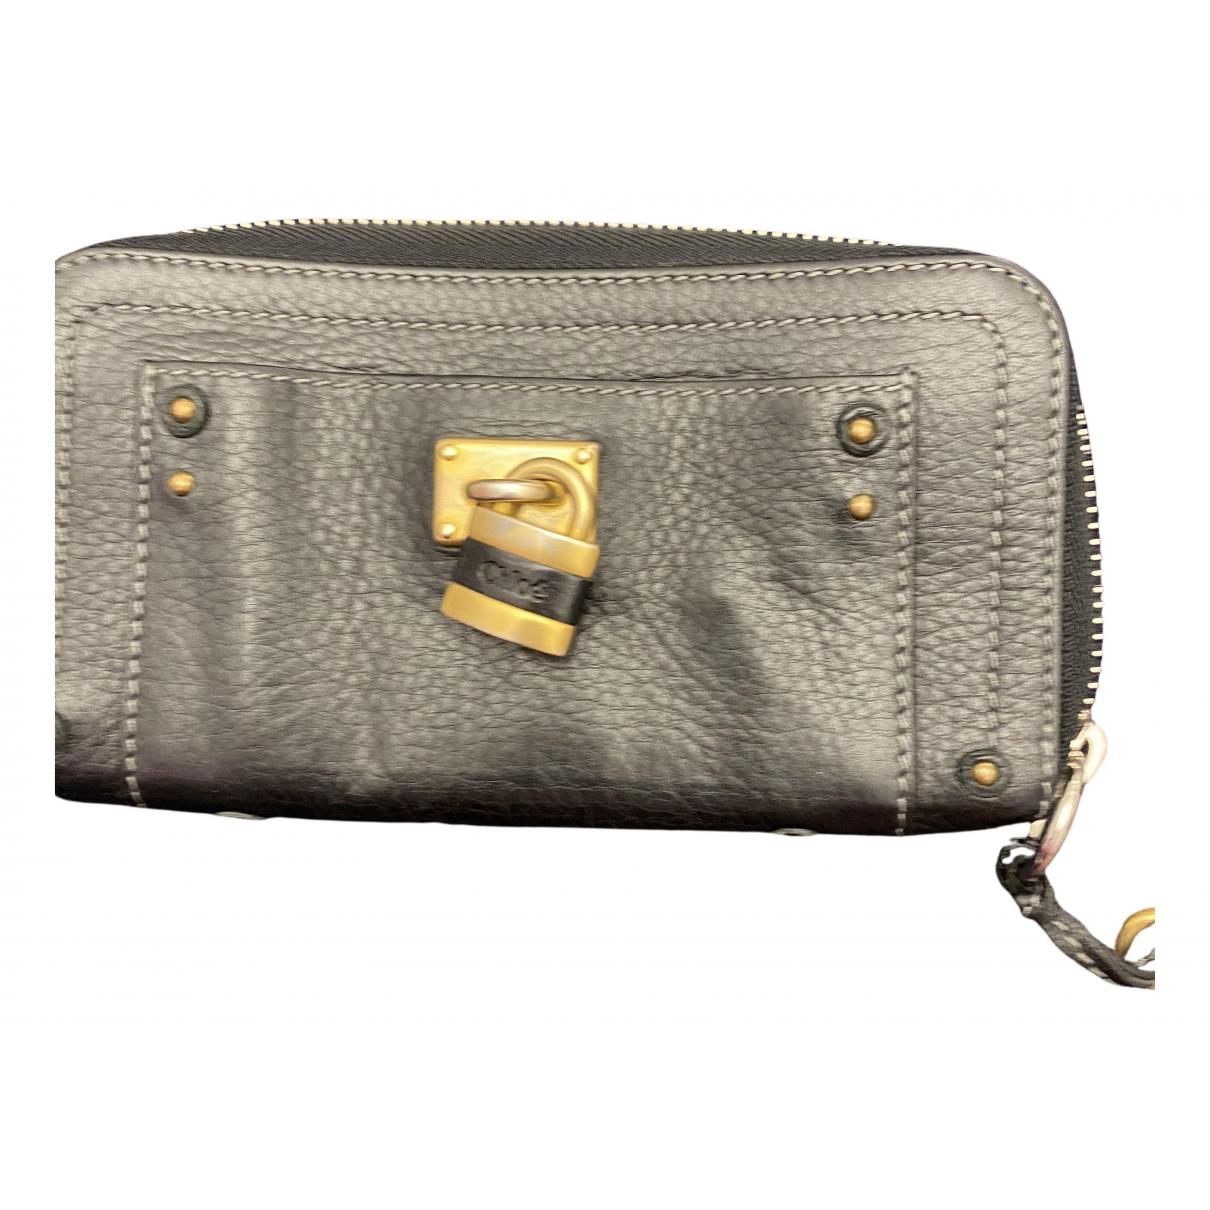 Chloé Marcie Black Leather wallet for Women N